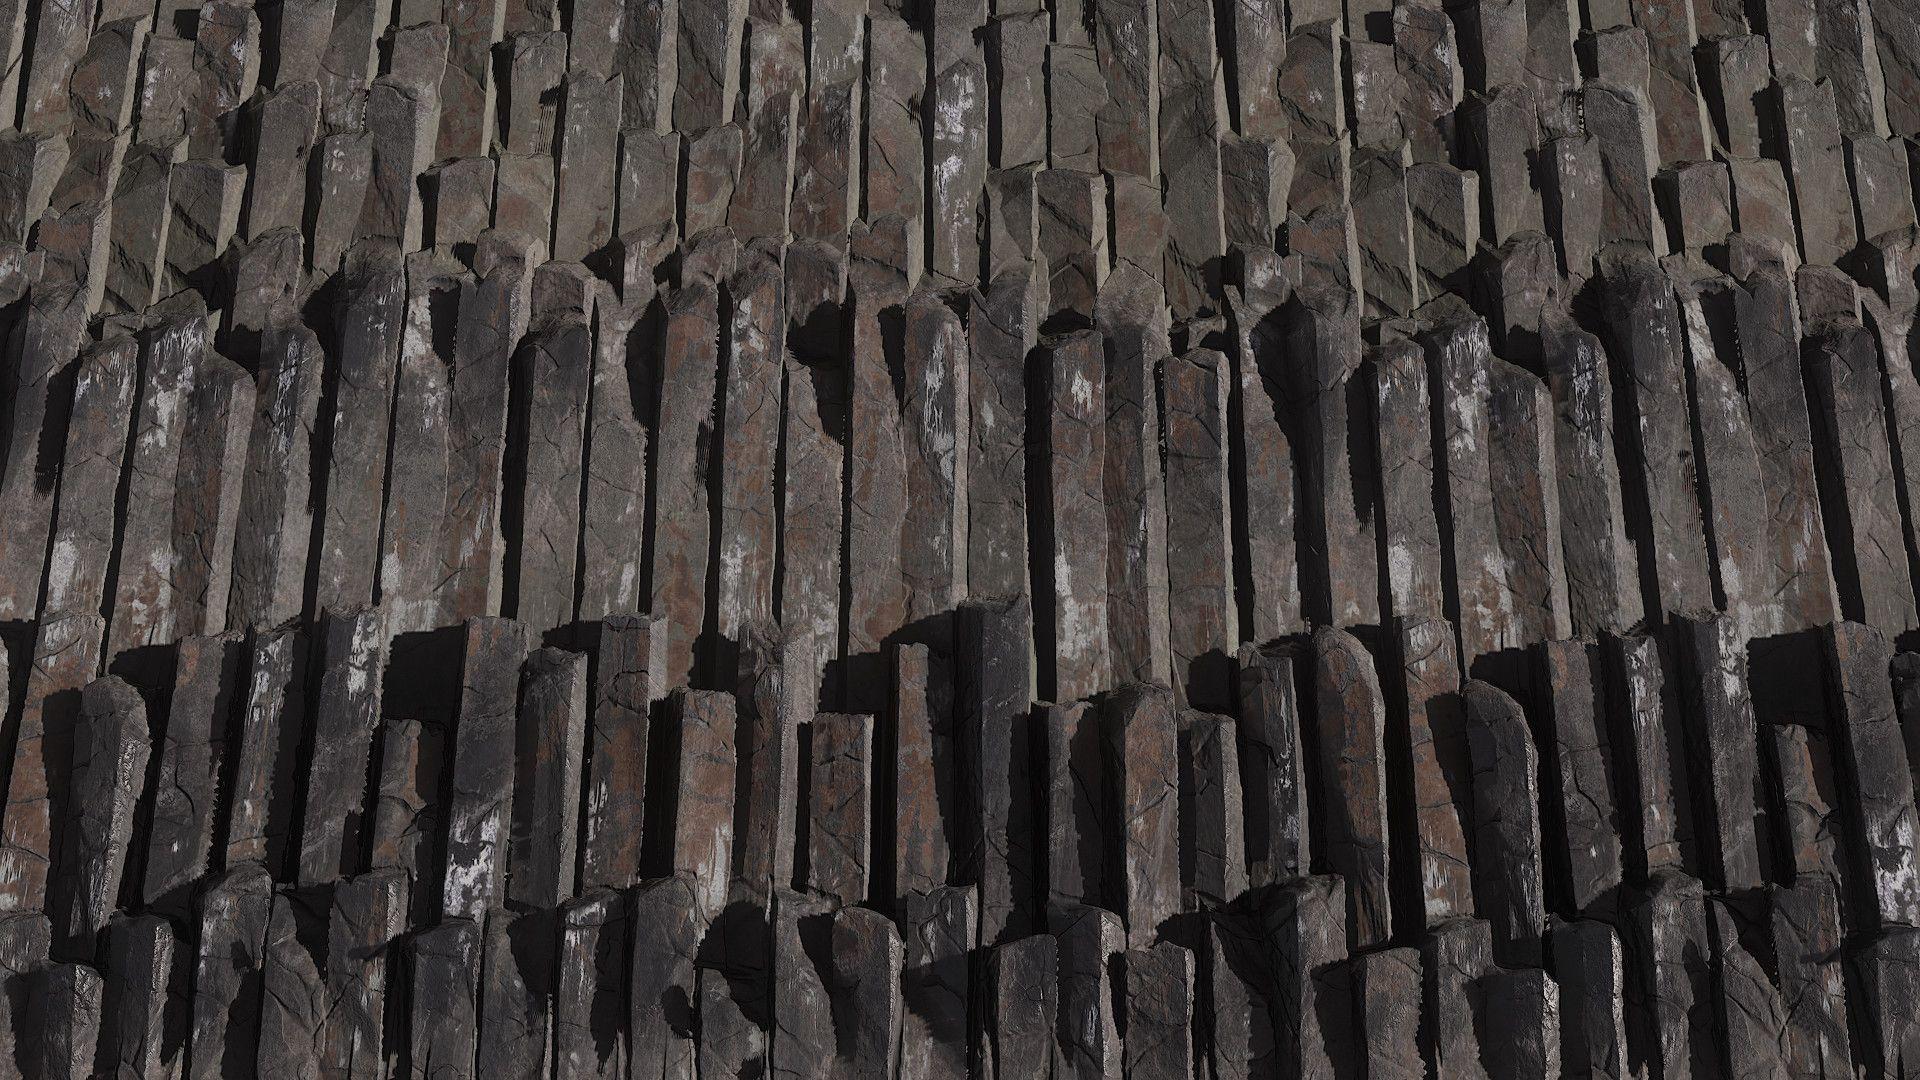 ArtStation - Iceland Series - Basalt Columns, Sergio Acevedo Ruiz